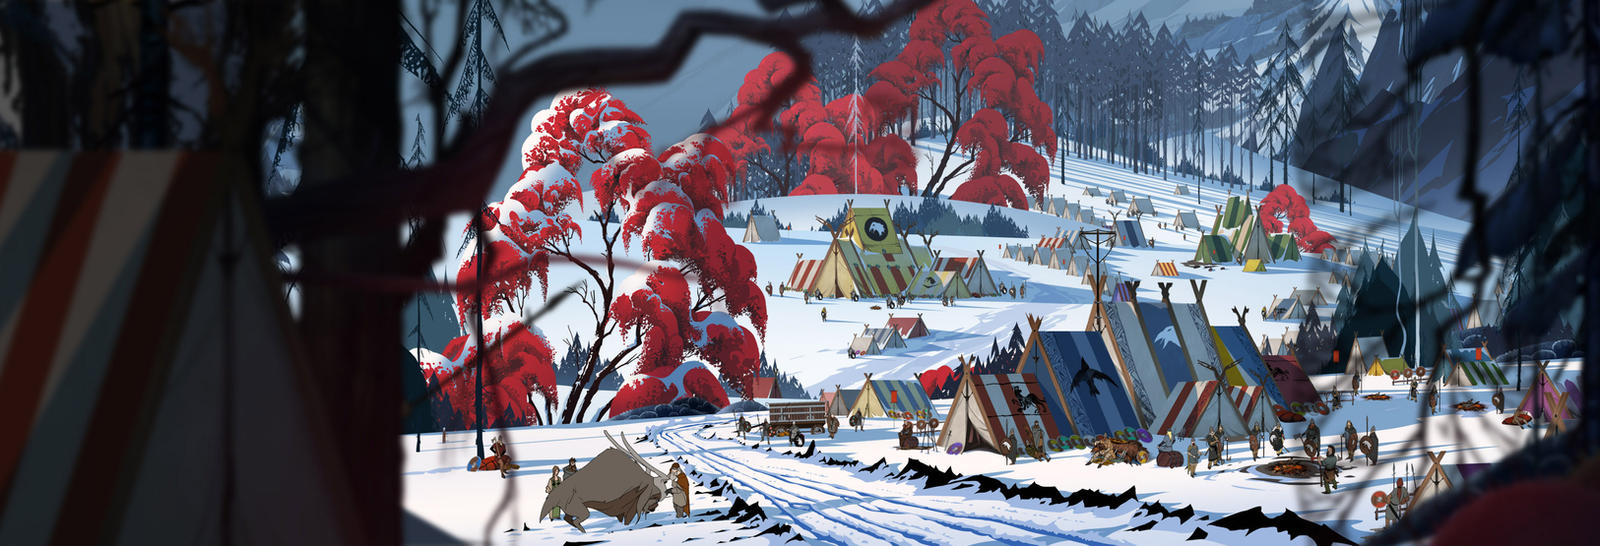 Bolverk Camp ver1